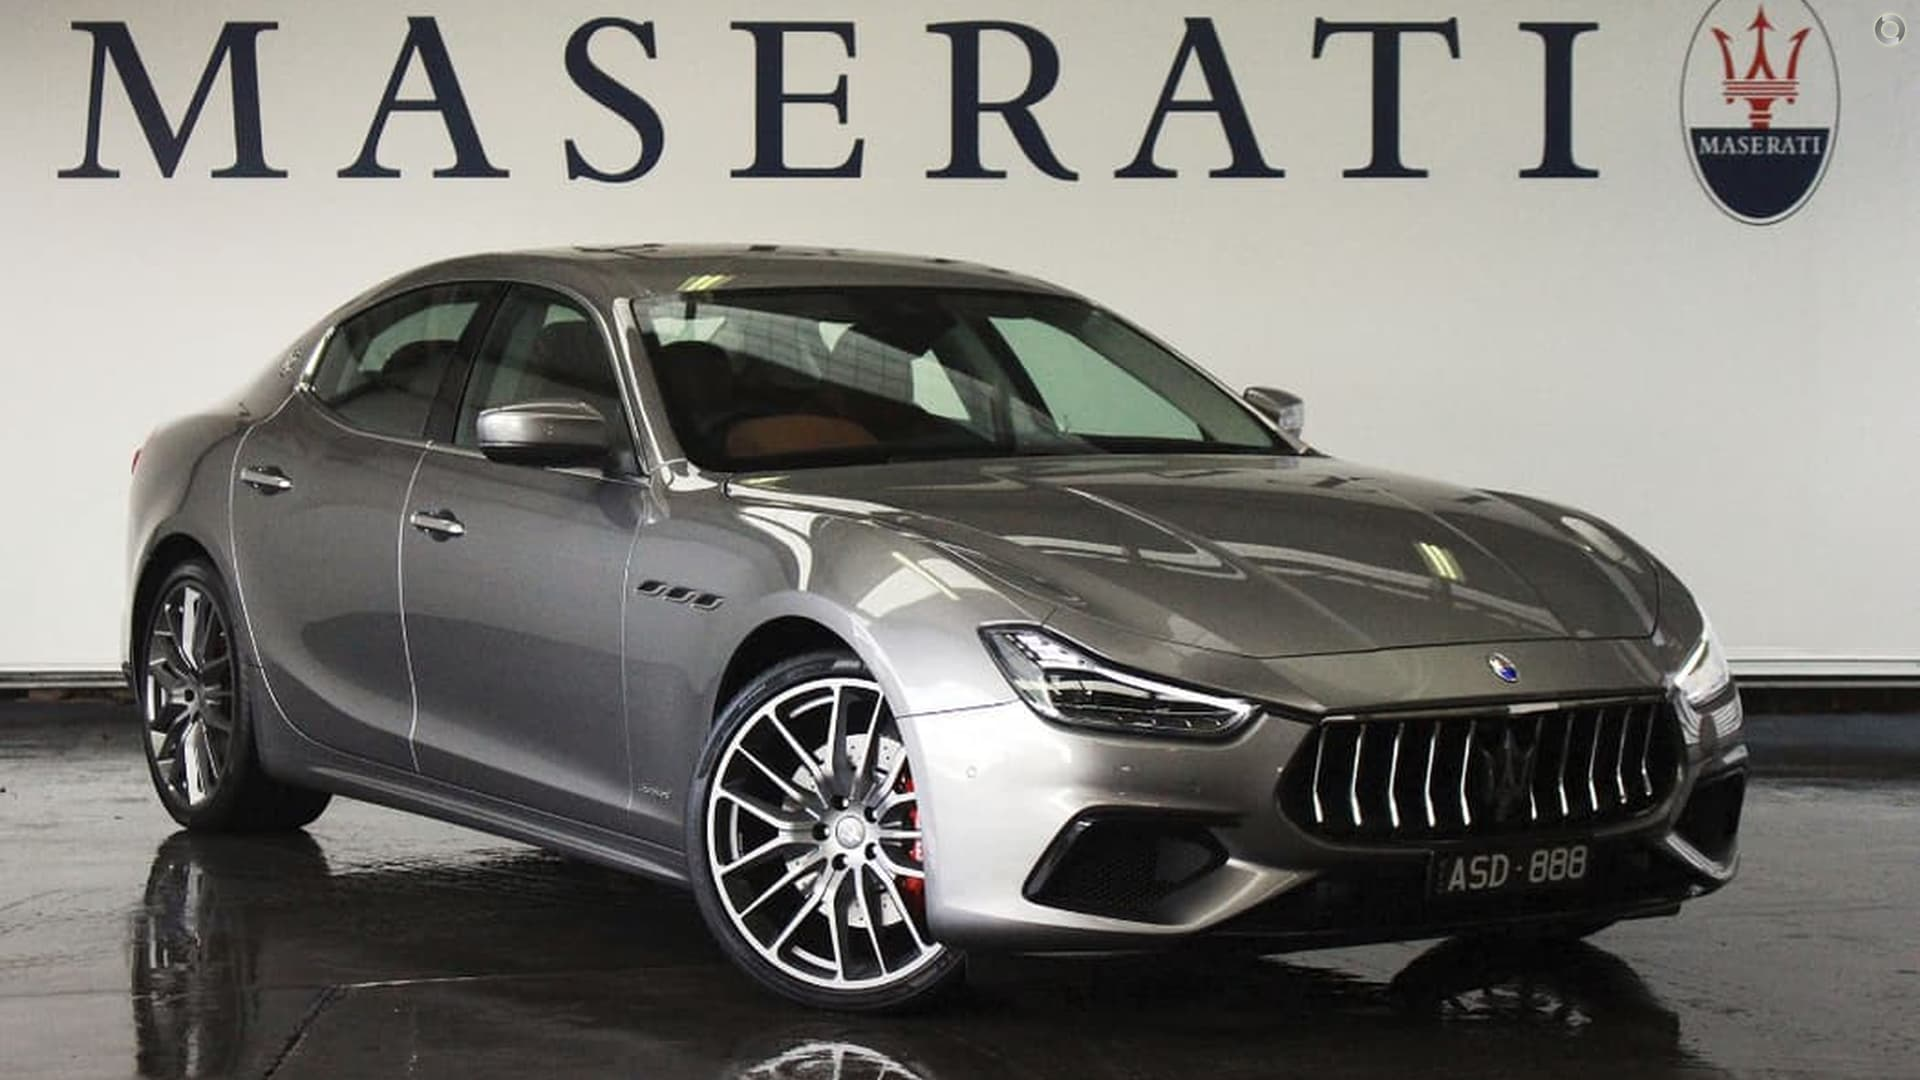 2017 Maserati Ghibli M157